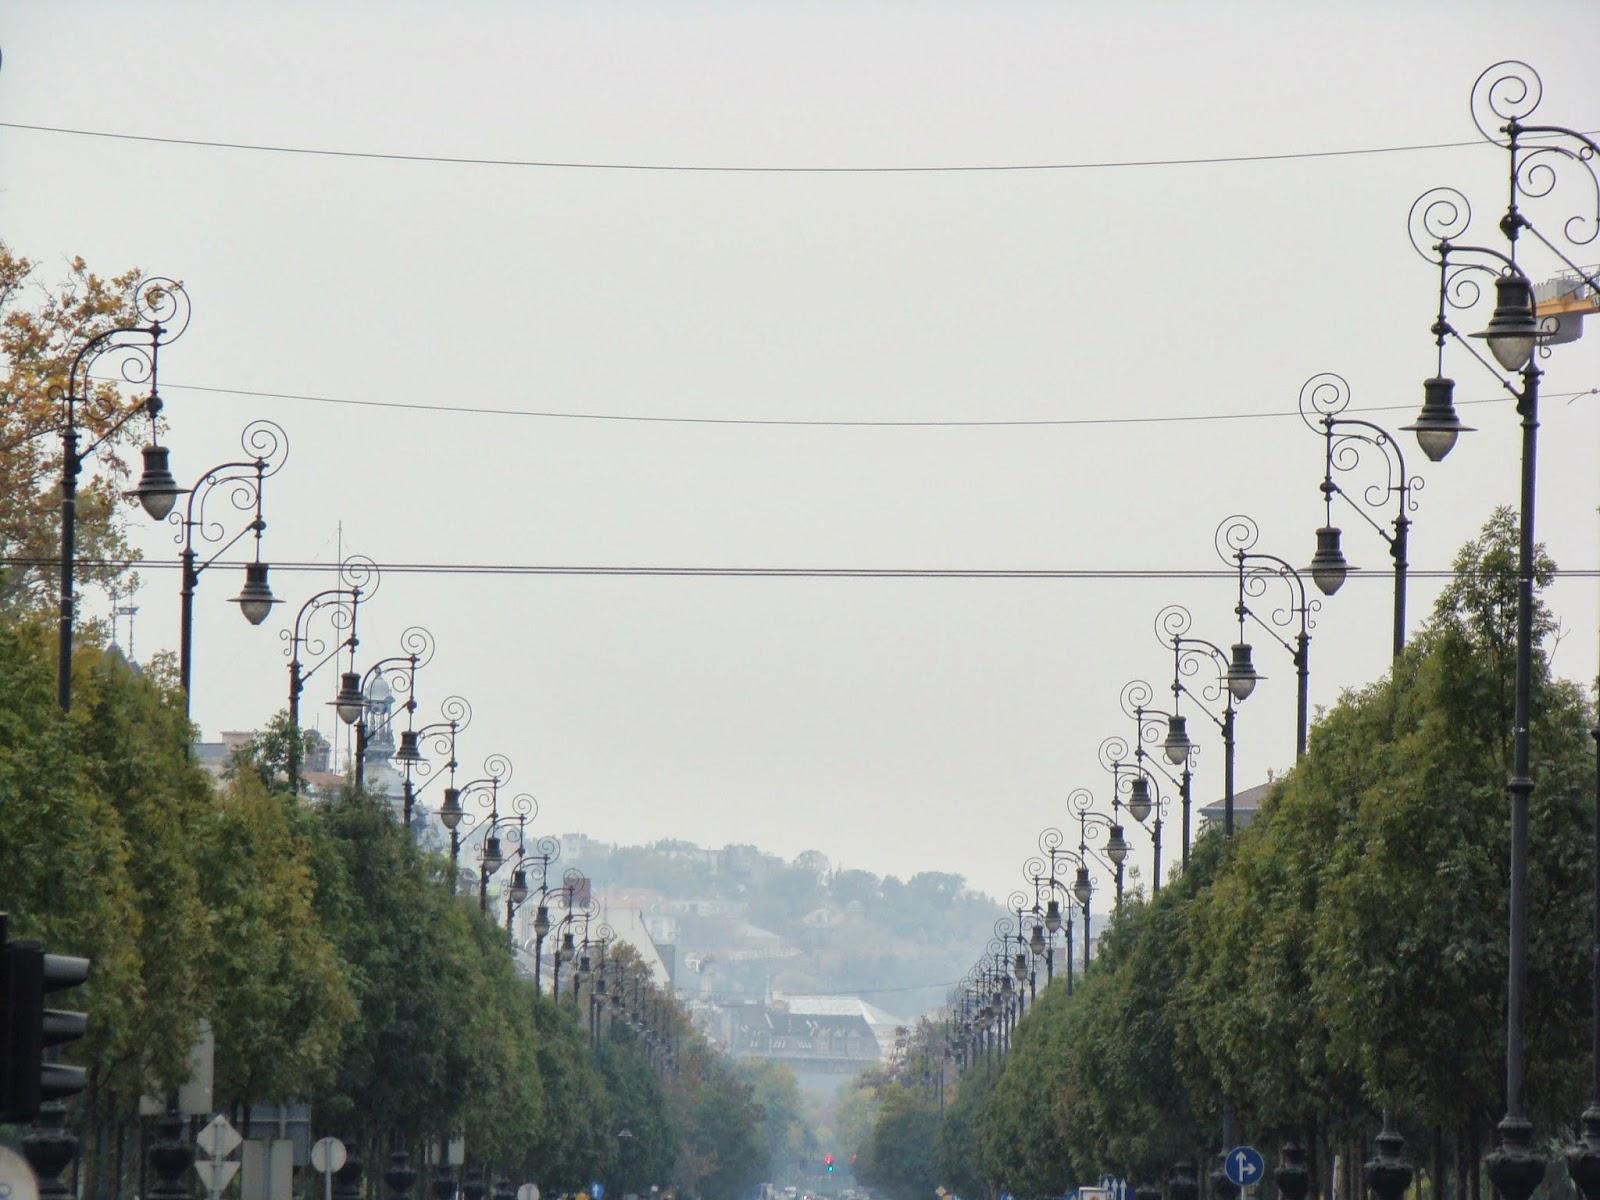 Avenida Andrassy, Budapest, Hungría, Elisa N, Blog de Viajes, Lifestyle, Travel